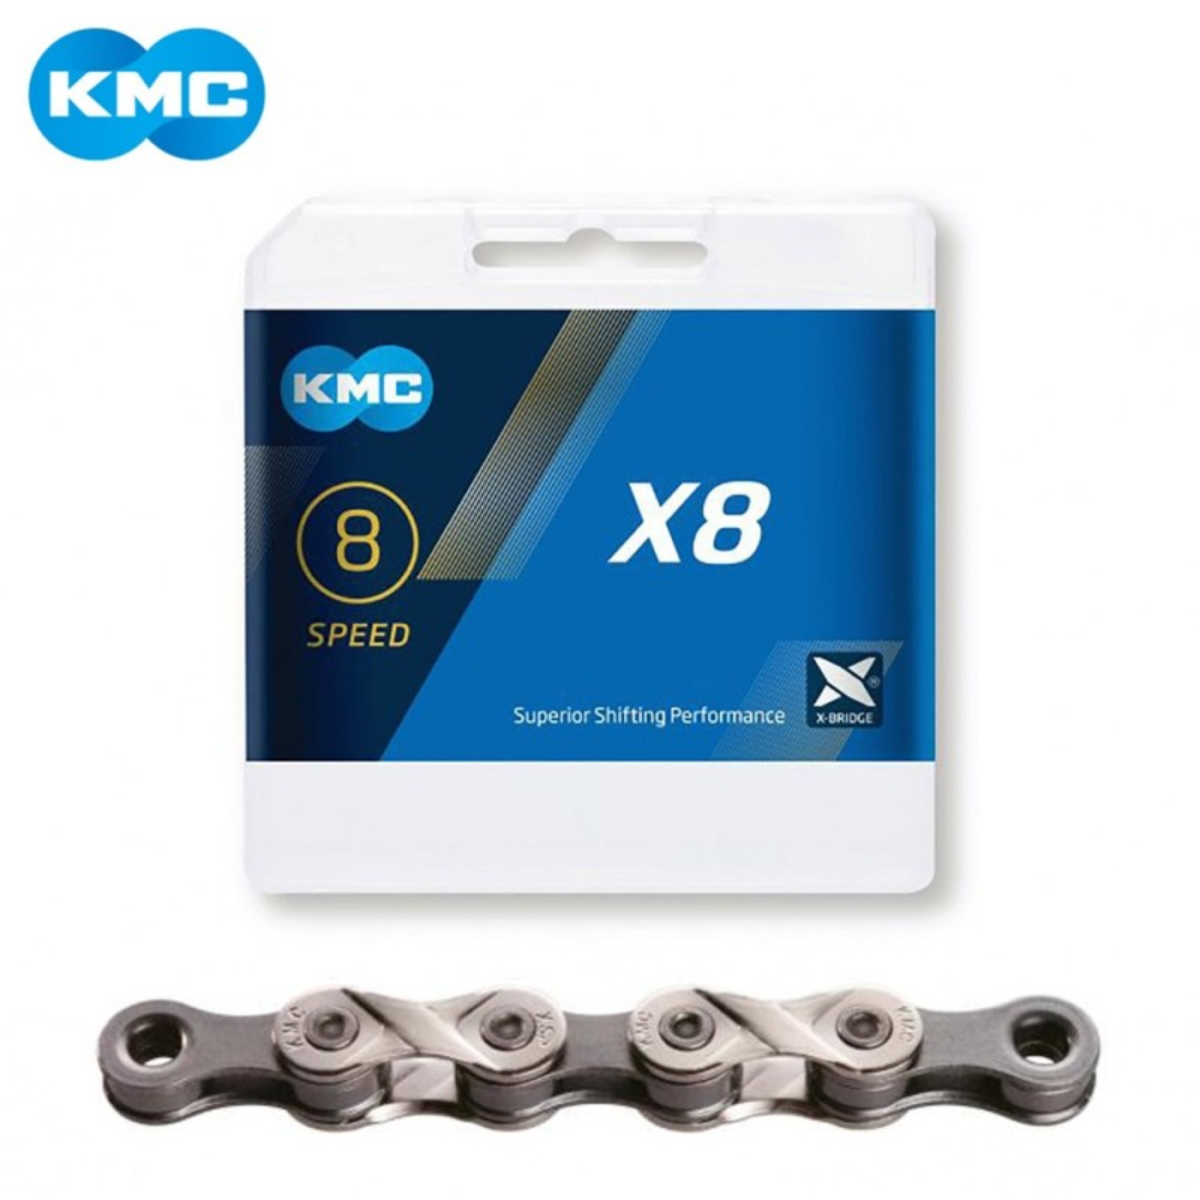 KMC ķēde X8 sudraba